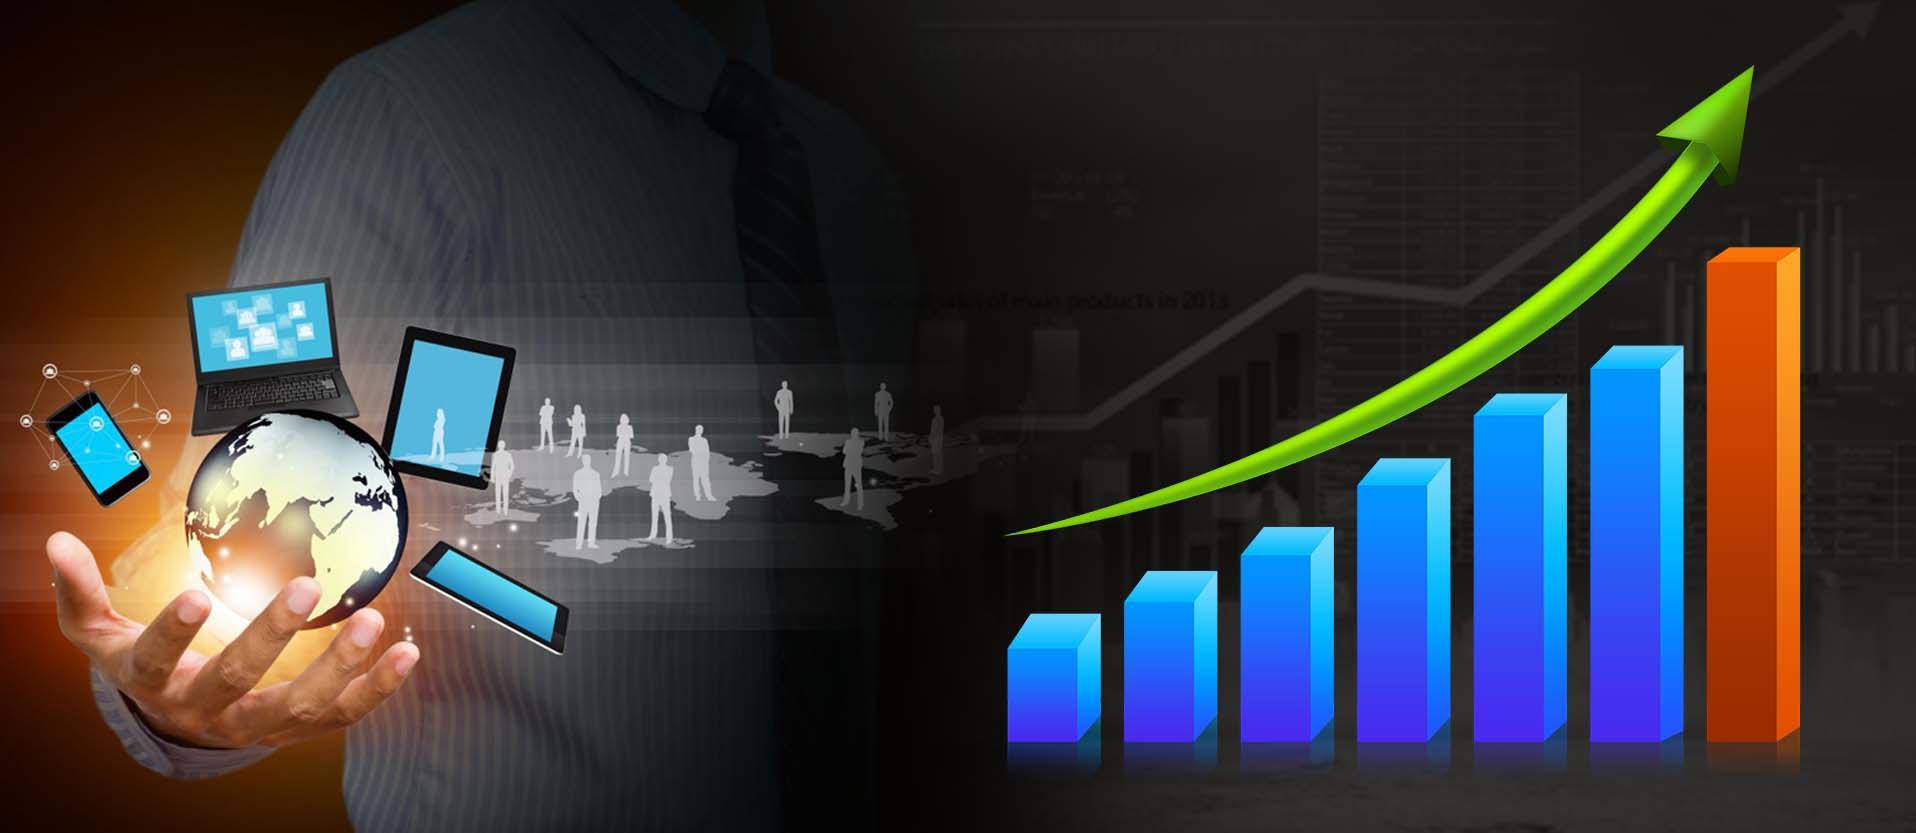 growth of bpo industry